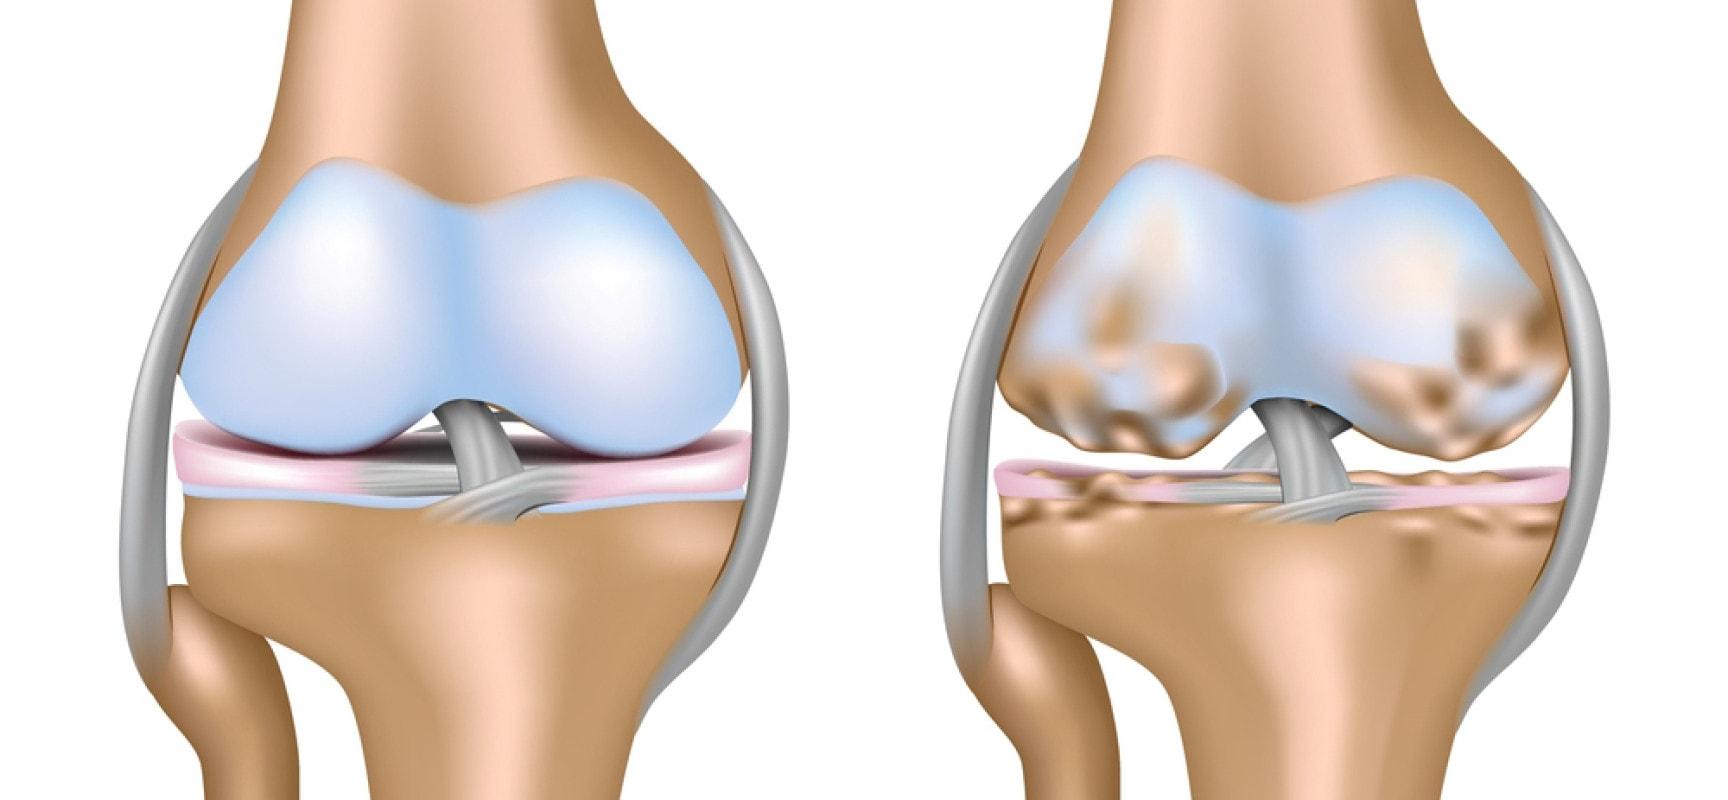 Двусторонний гонартроз коленных суставов 1, 2, 3 степени